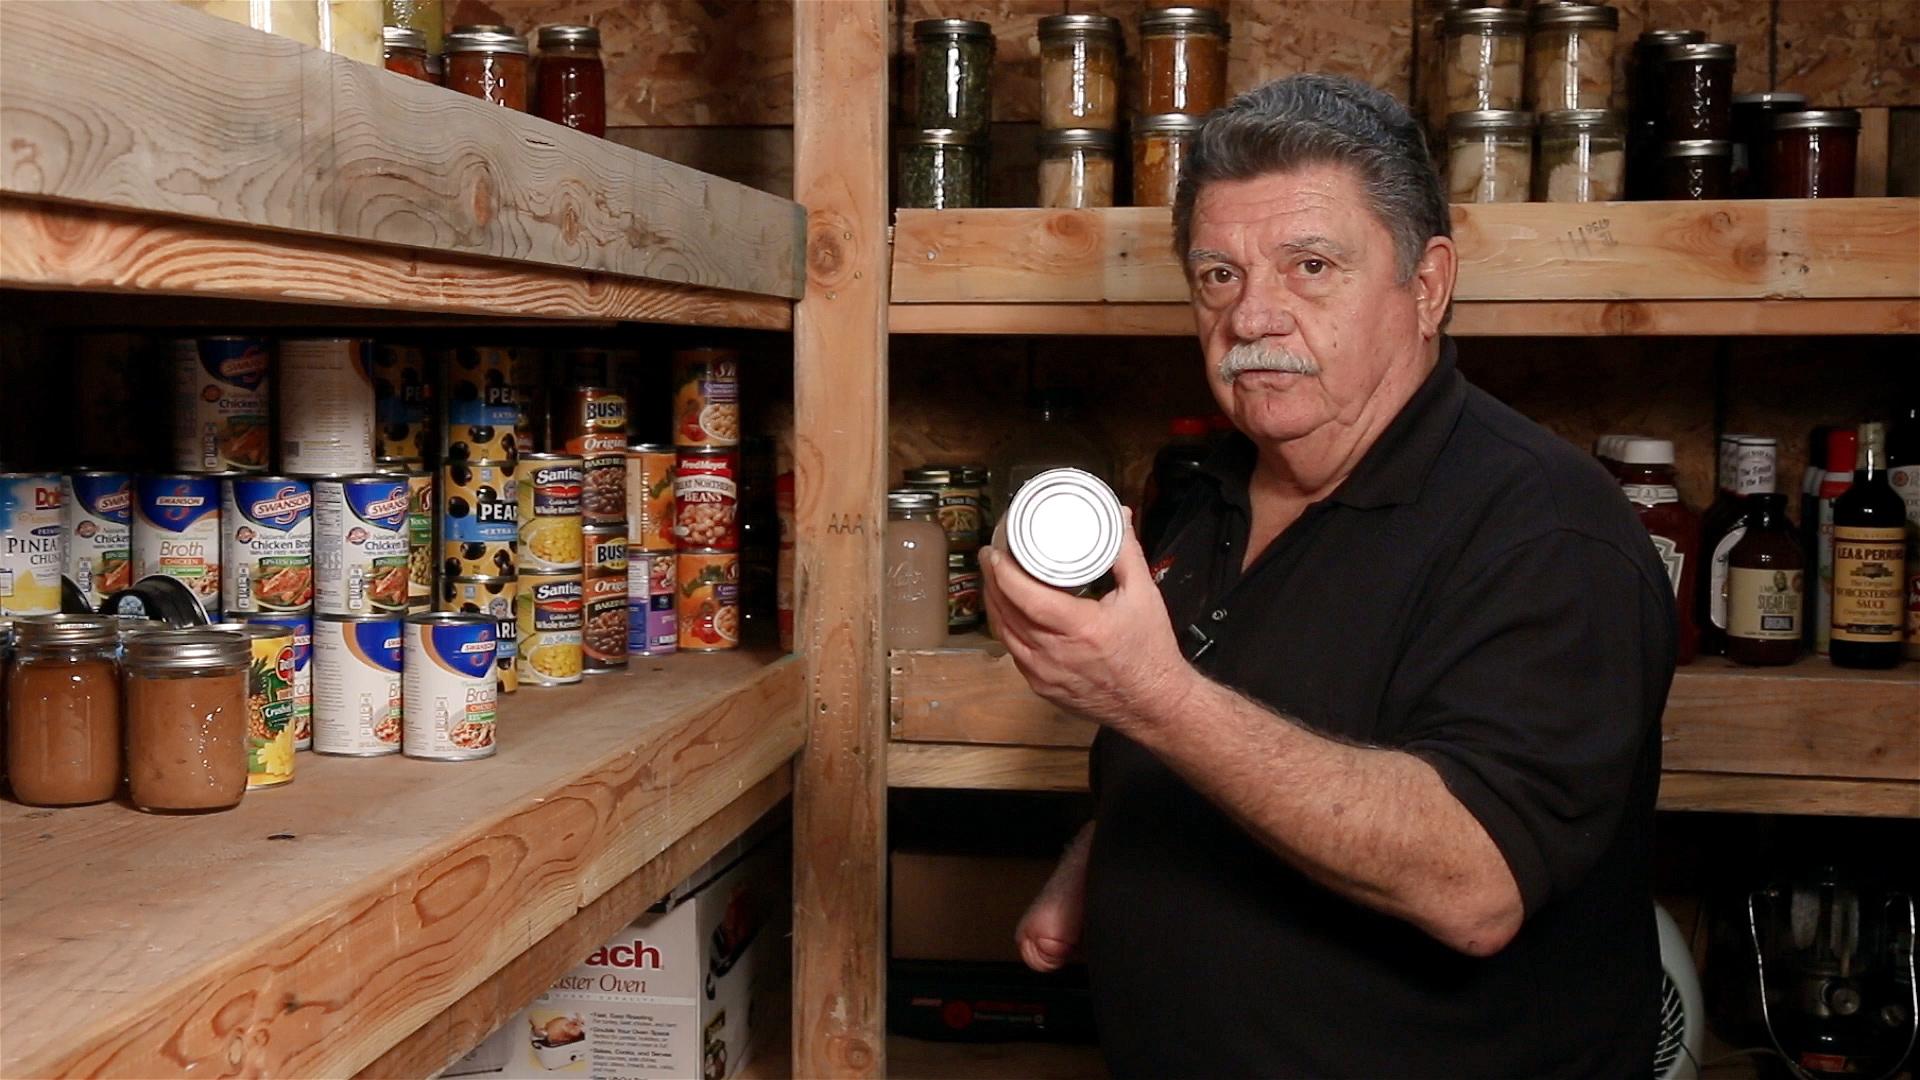 John Pantry holding can